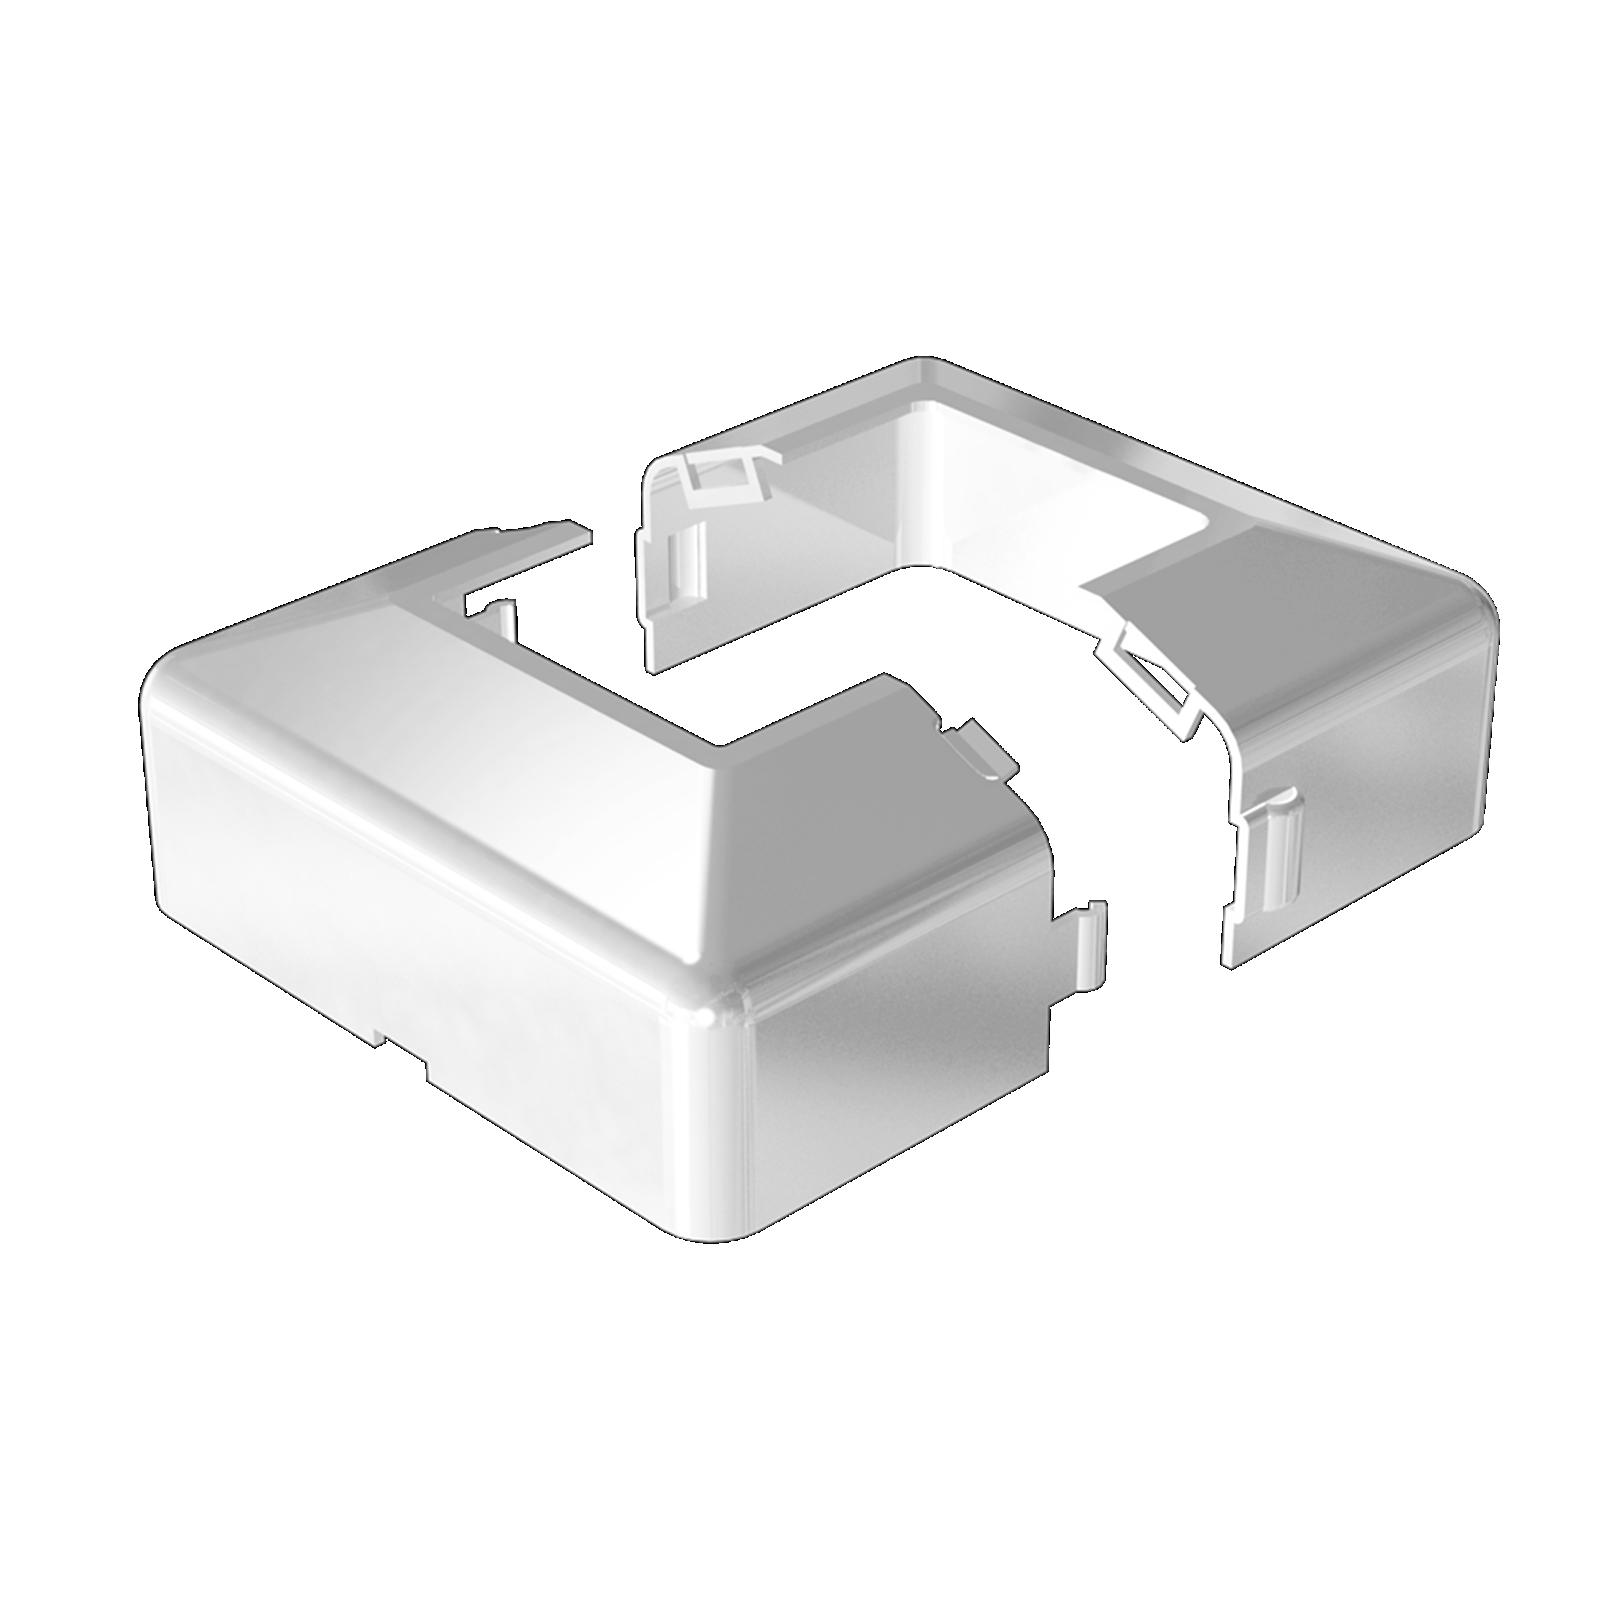 Peak Aluminium Balustrade Post Base Cover